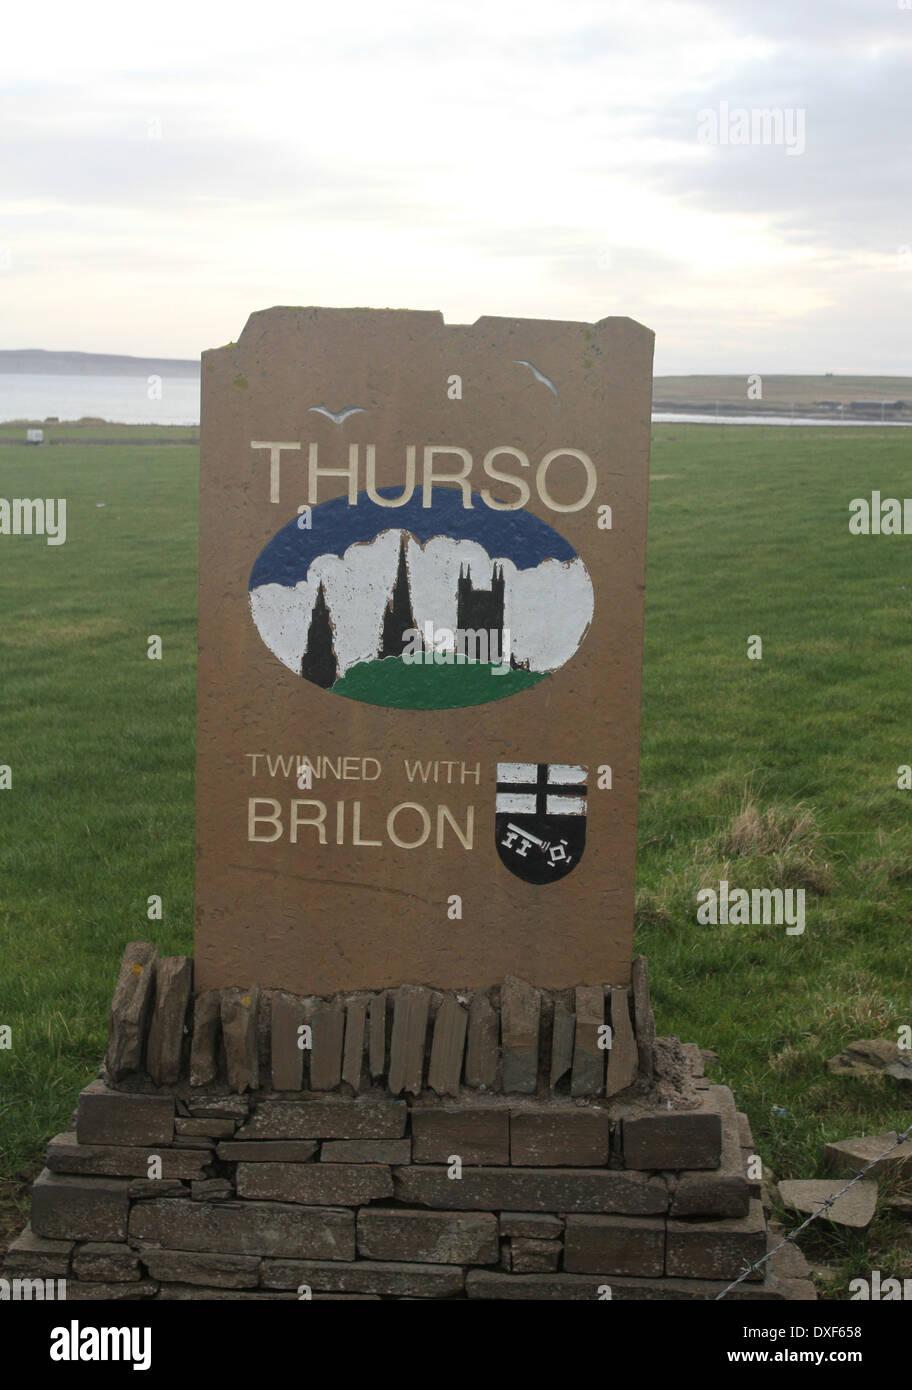 Thurso sign Caithness Scotland March 2014 - Stock Image